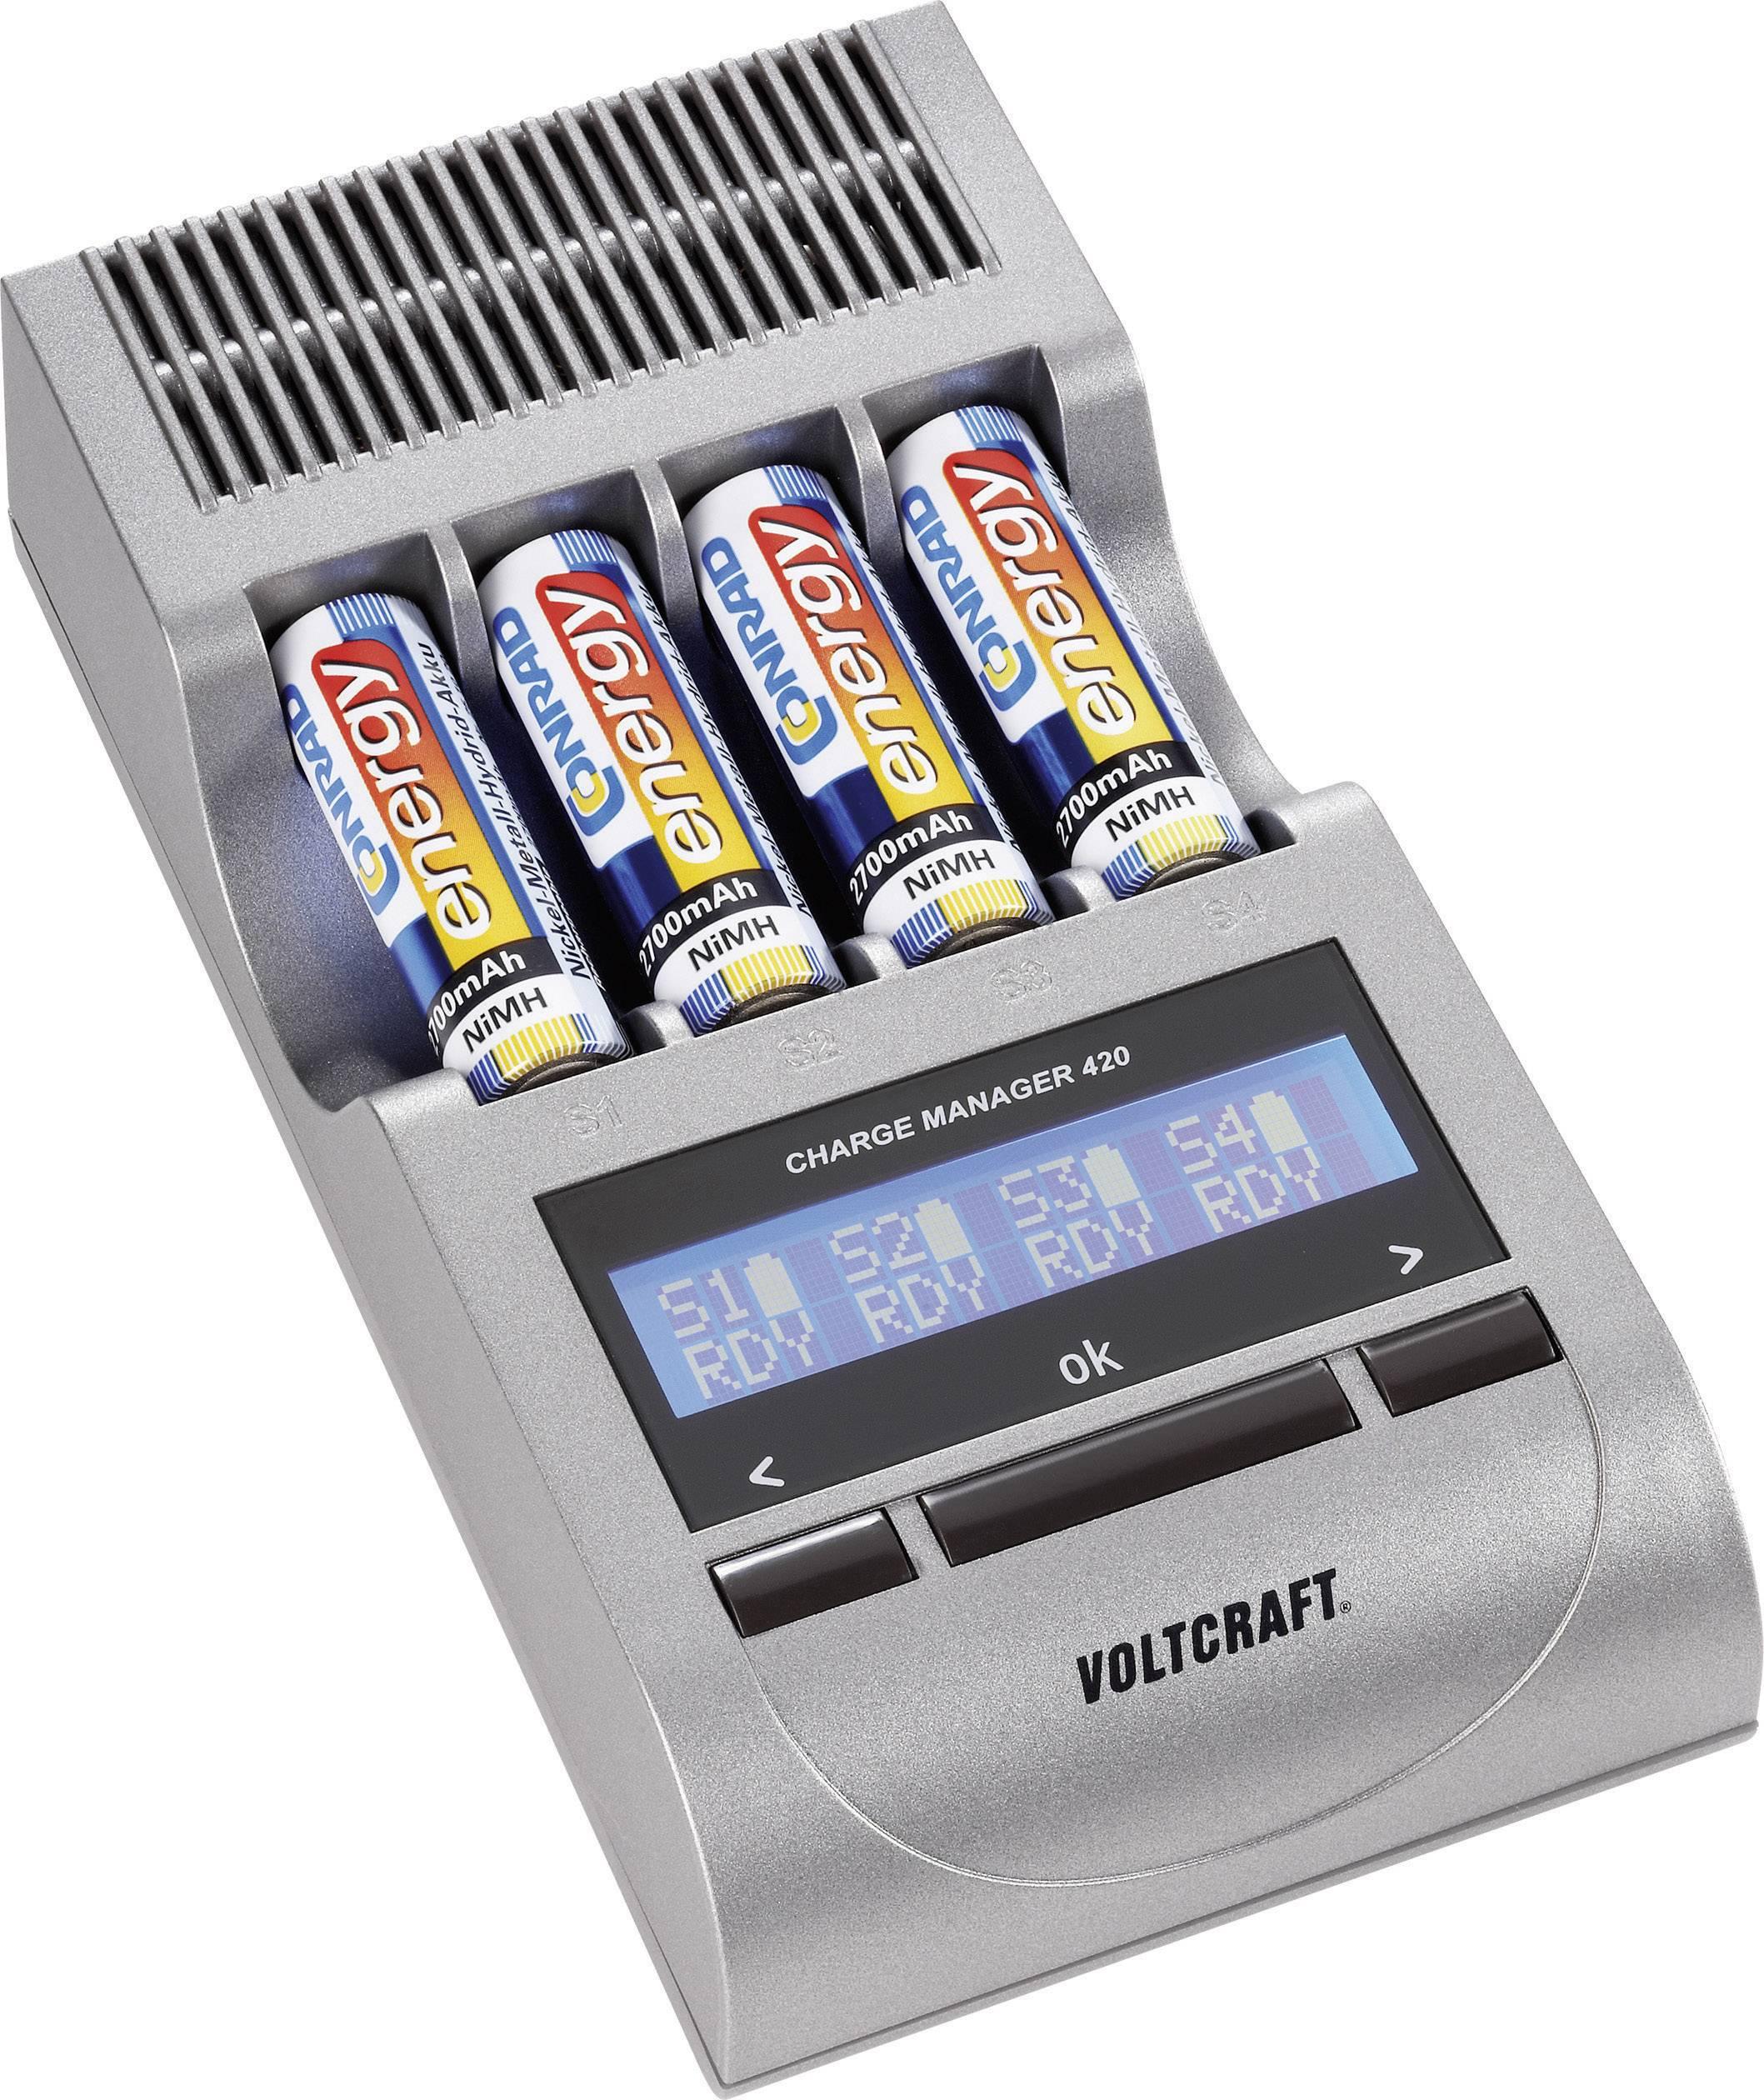 Nabíjačka na okrúhle akumulátory VOLTCRAFT CM 420, 202420, micro (AAA), mignon (AA)